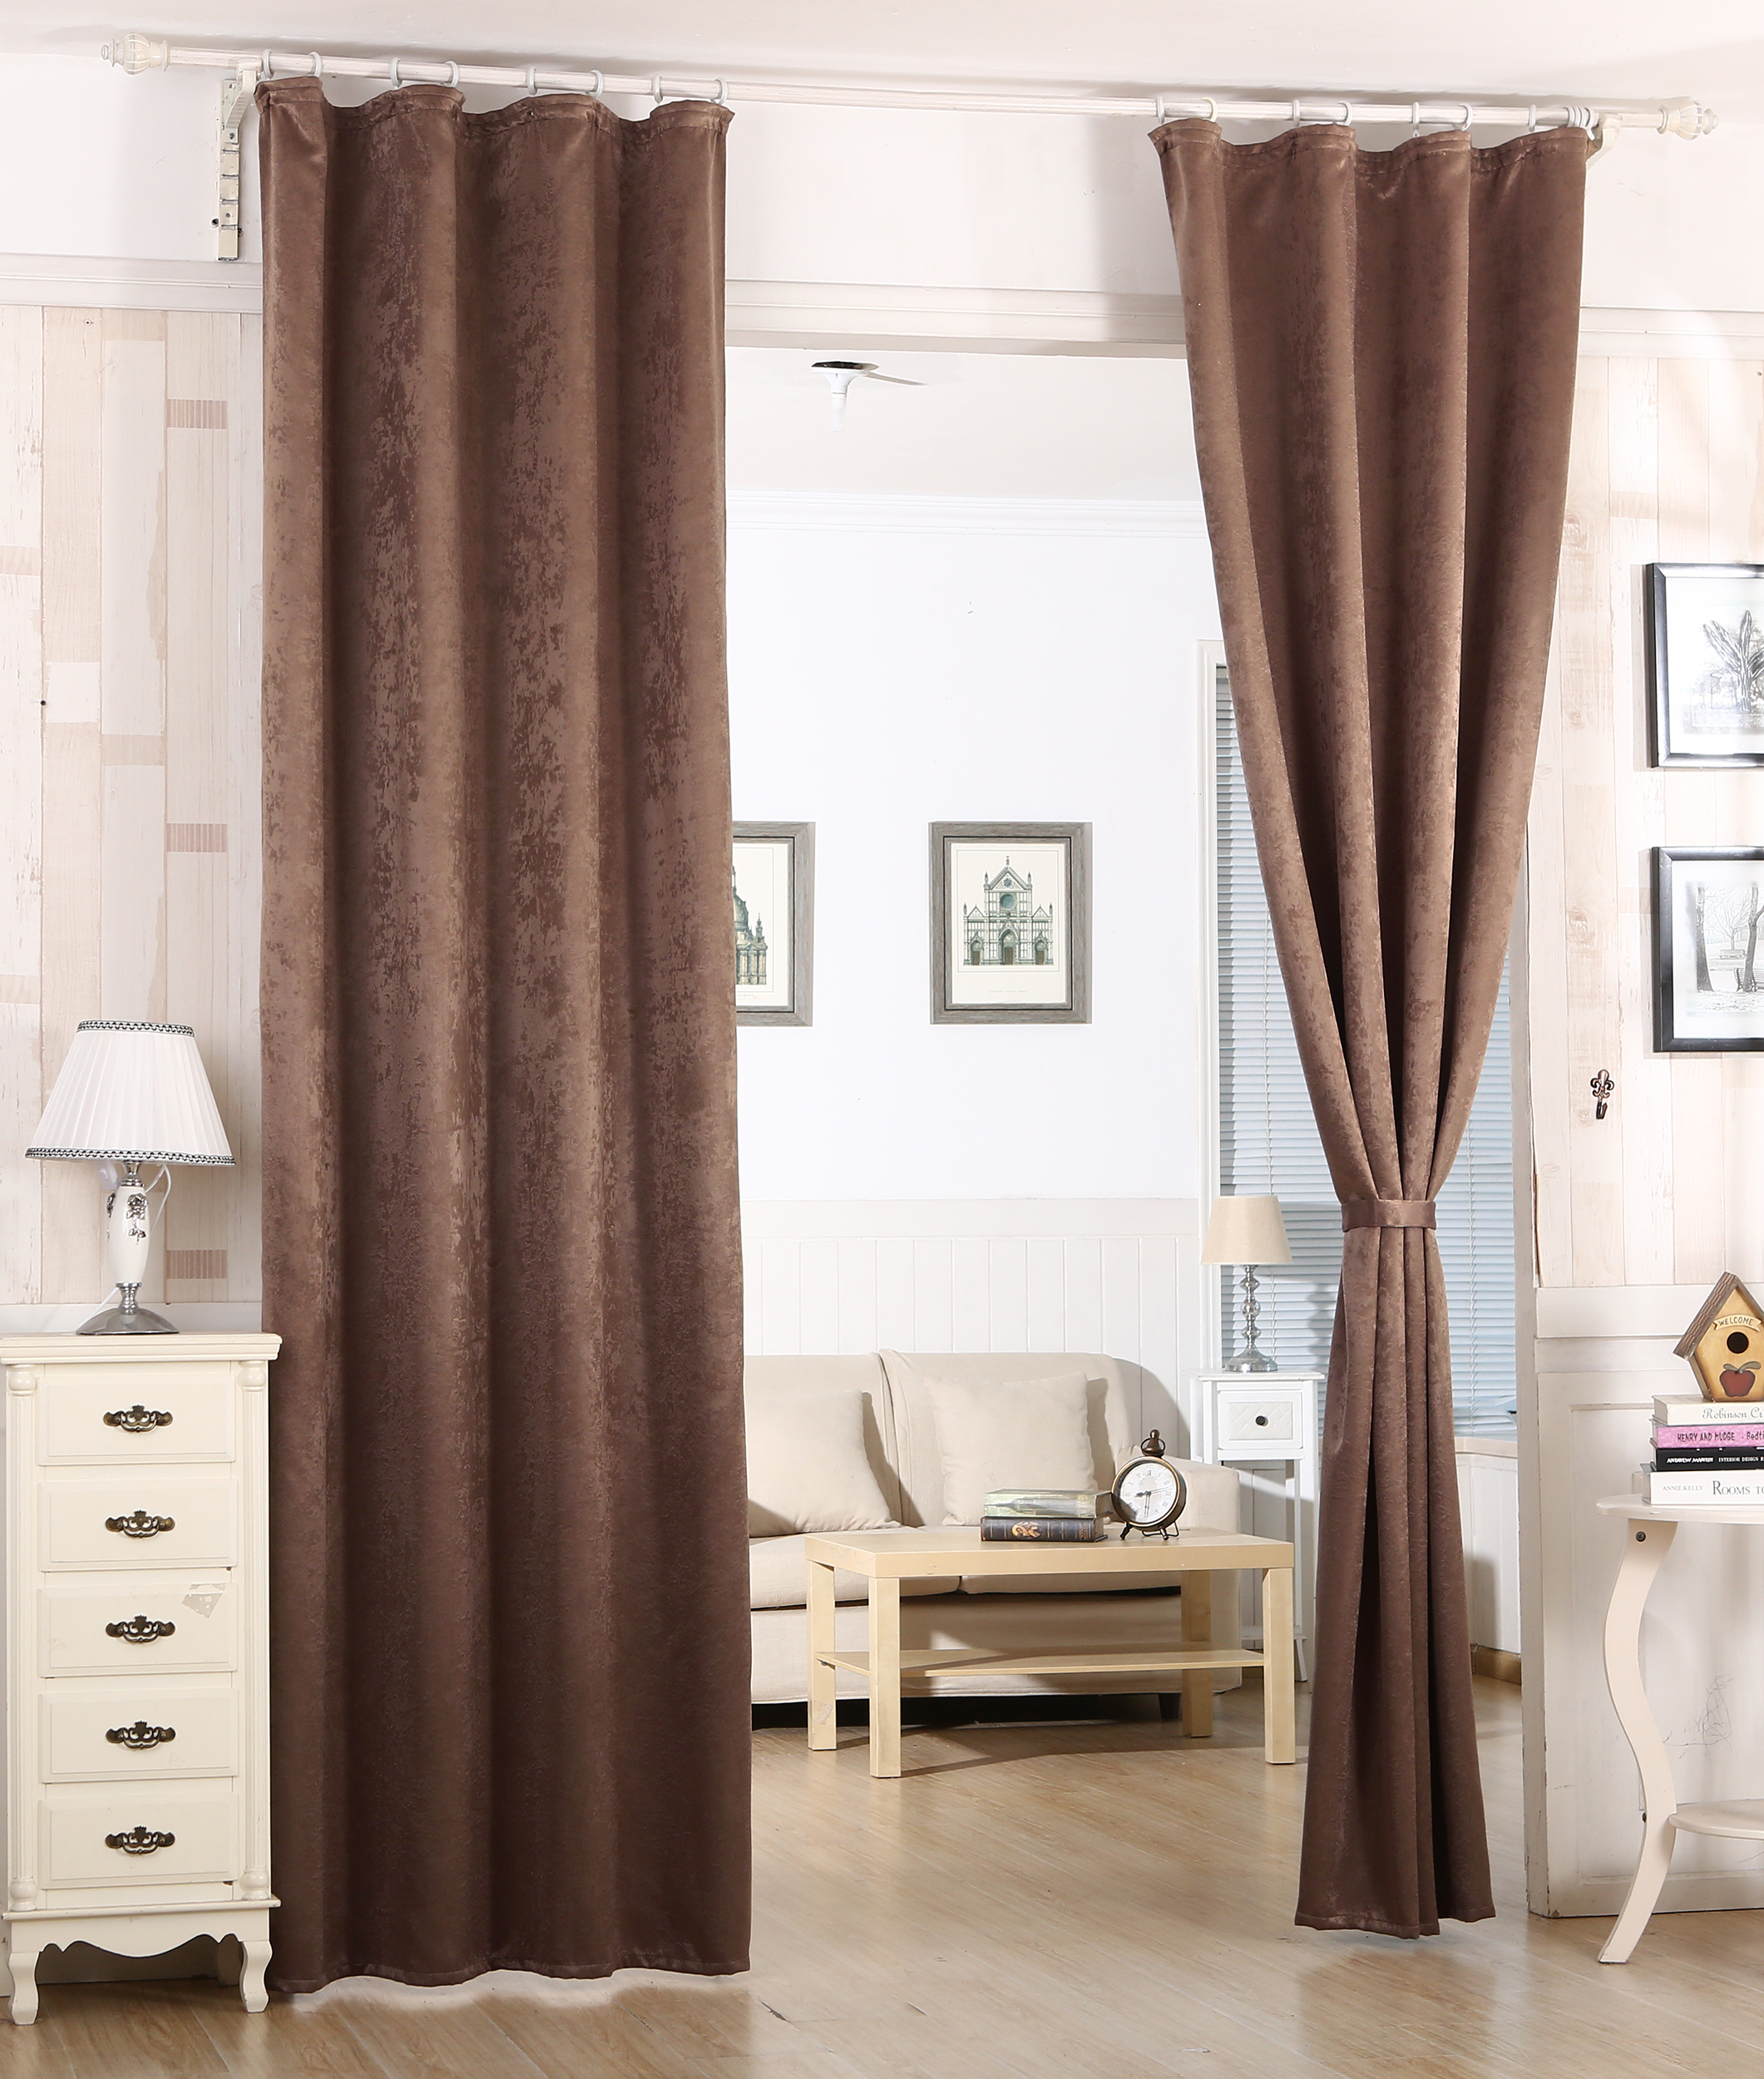 gardine blickdicht kr uselband thermogardine verdunkelungsgardine vorhang 341 ebay. Black Bedroom Furniture Sets. Home Design Ideas